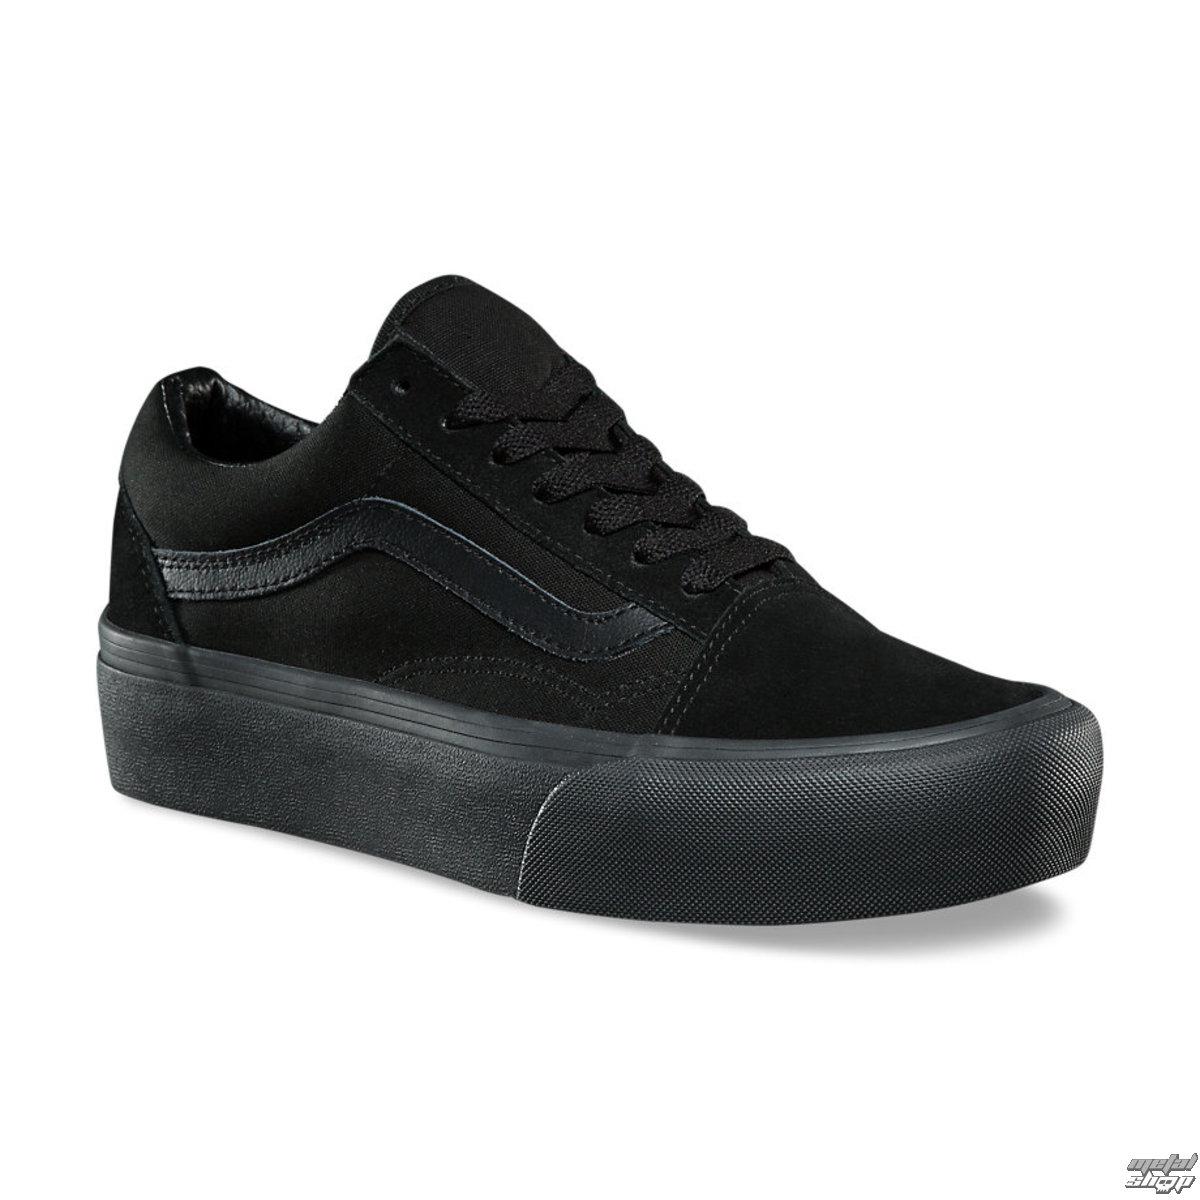 b0110c06df7 topánky dámske VANS - UA OLD Skool PLATFORM Black   Black - VA3B3UBKA